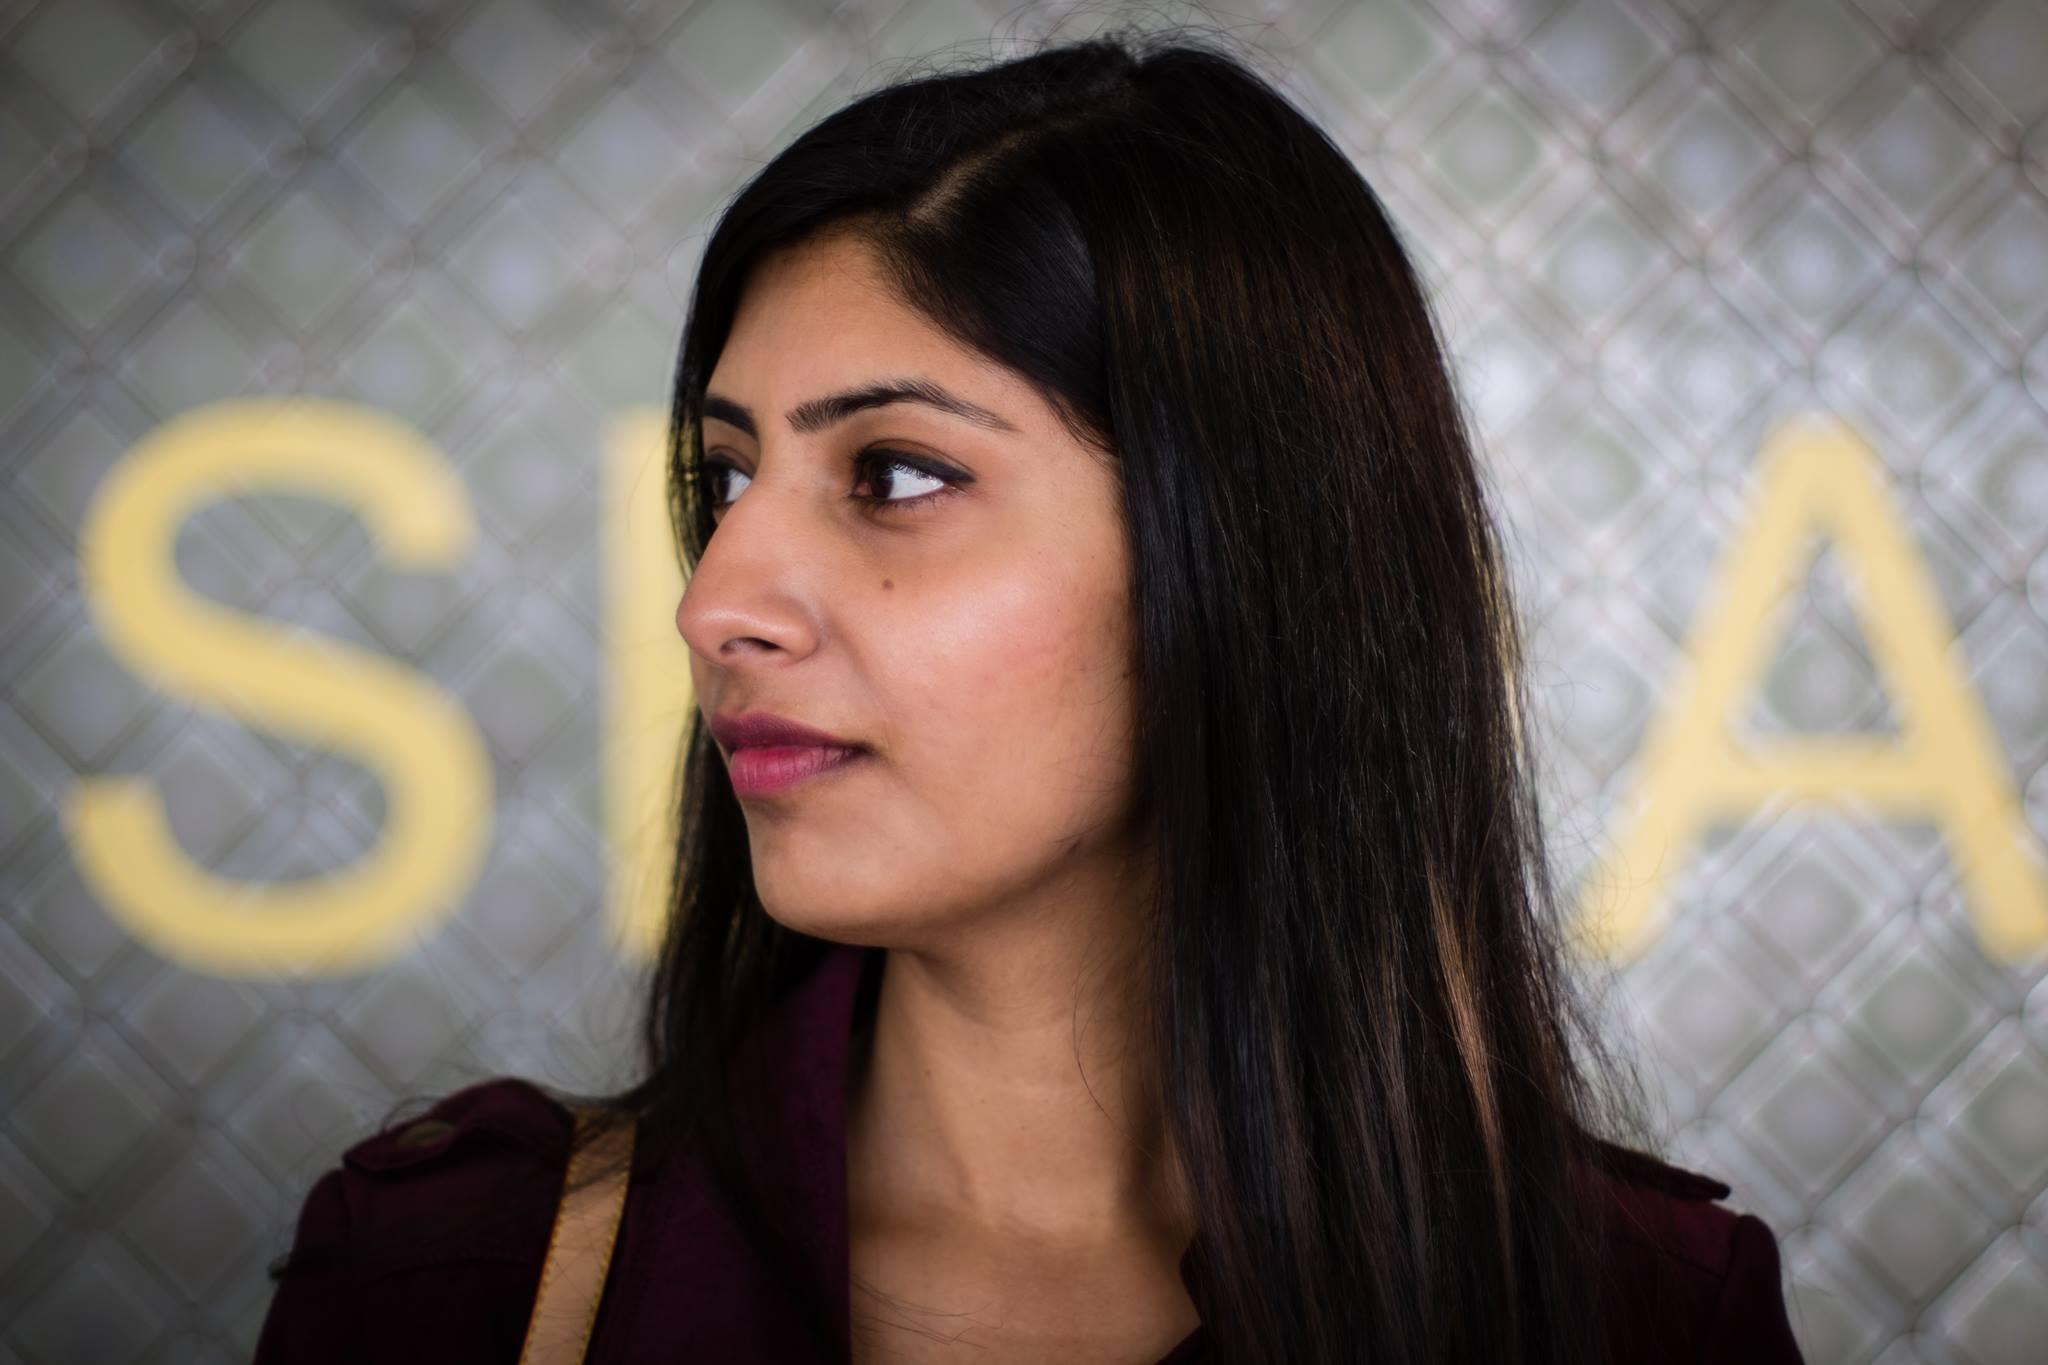 Amrita-Mathur-headshot.jpg